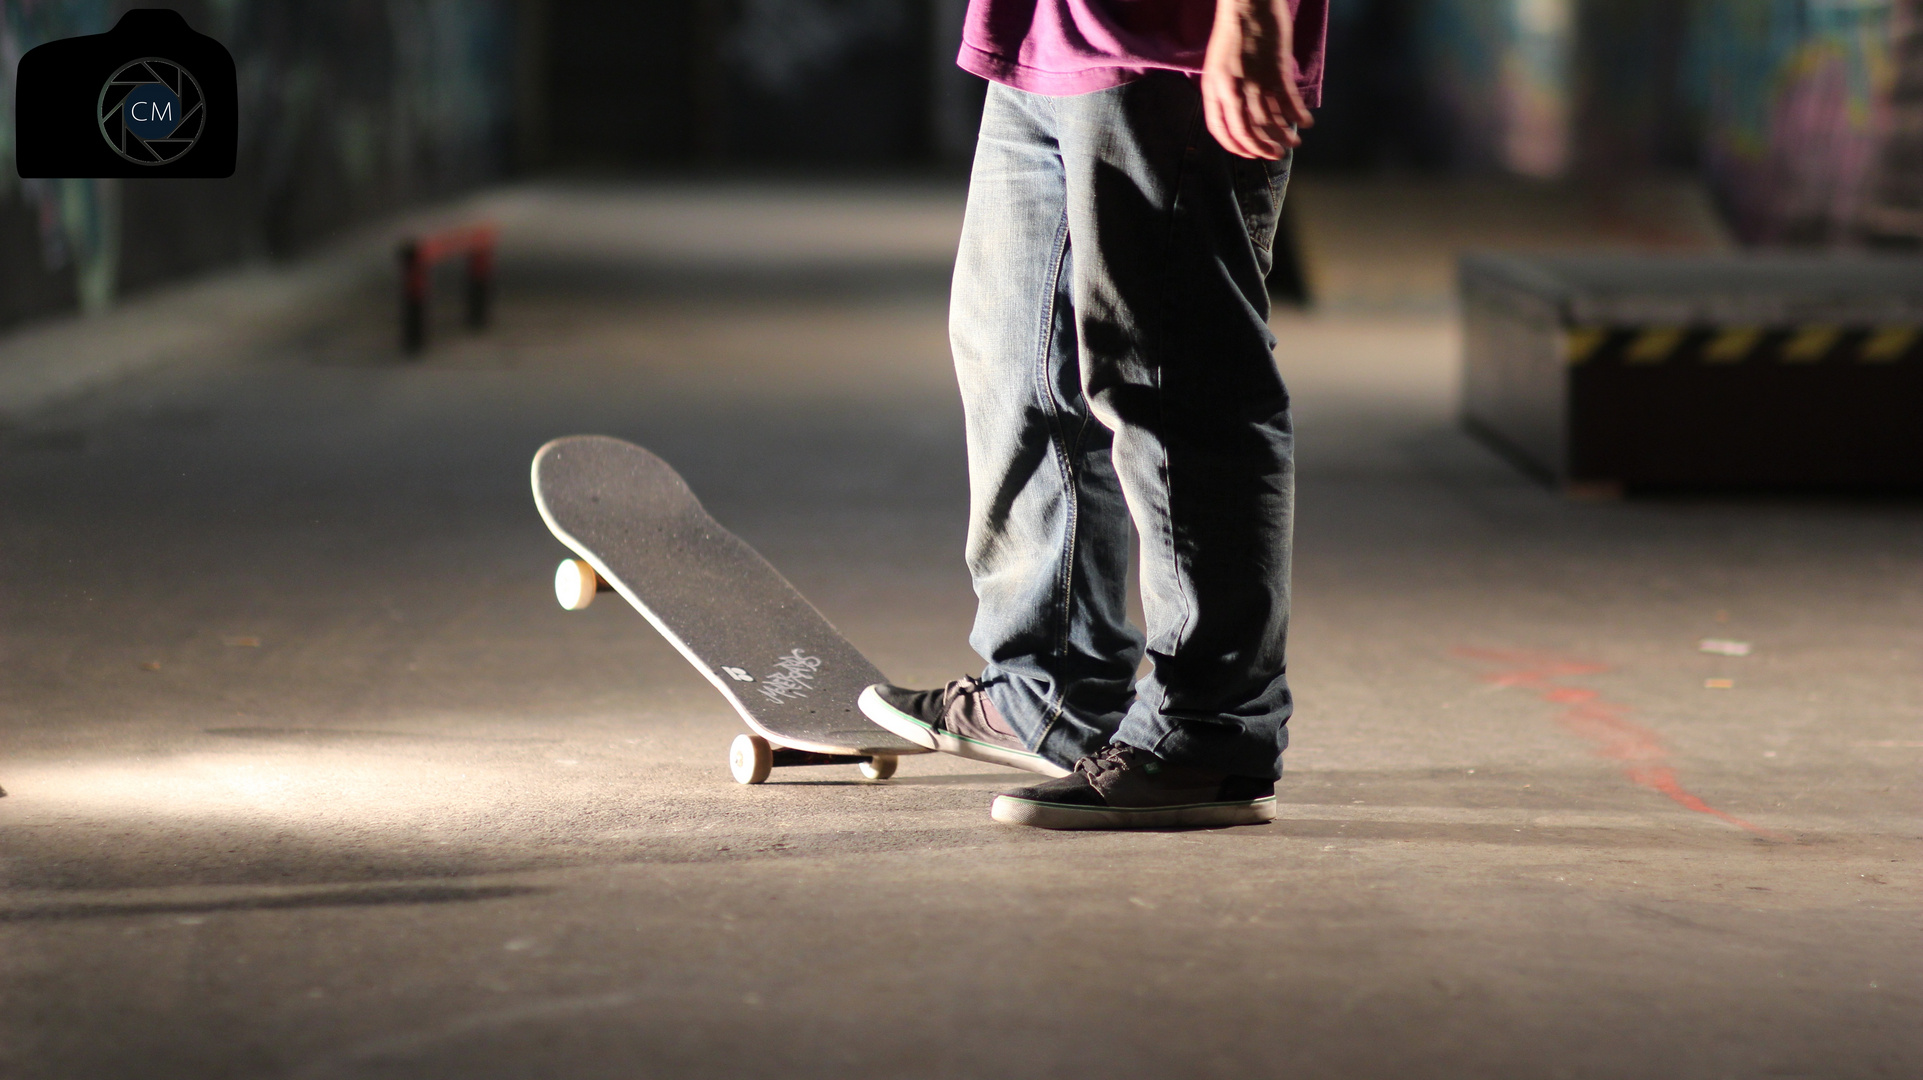 Night skateboarding